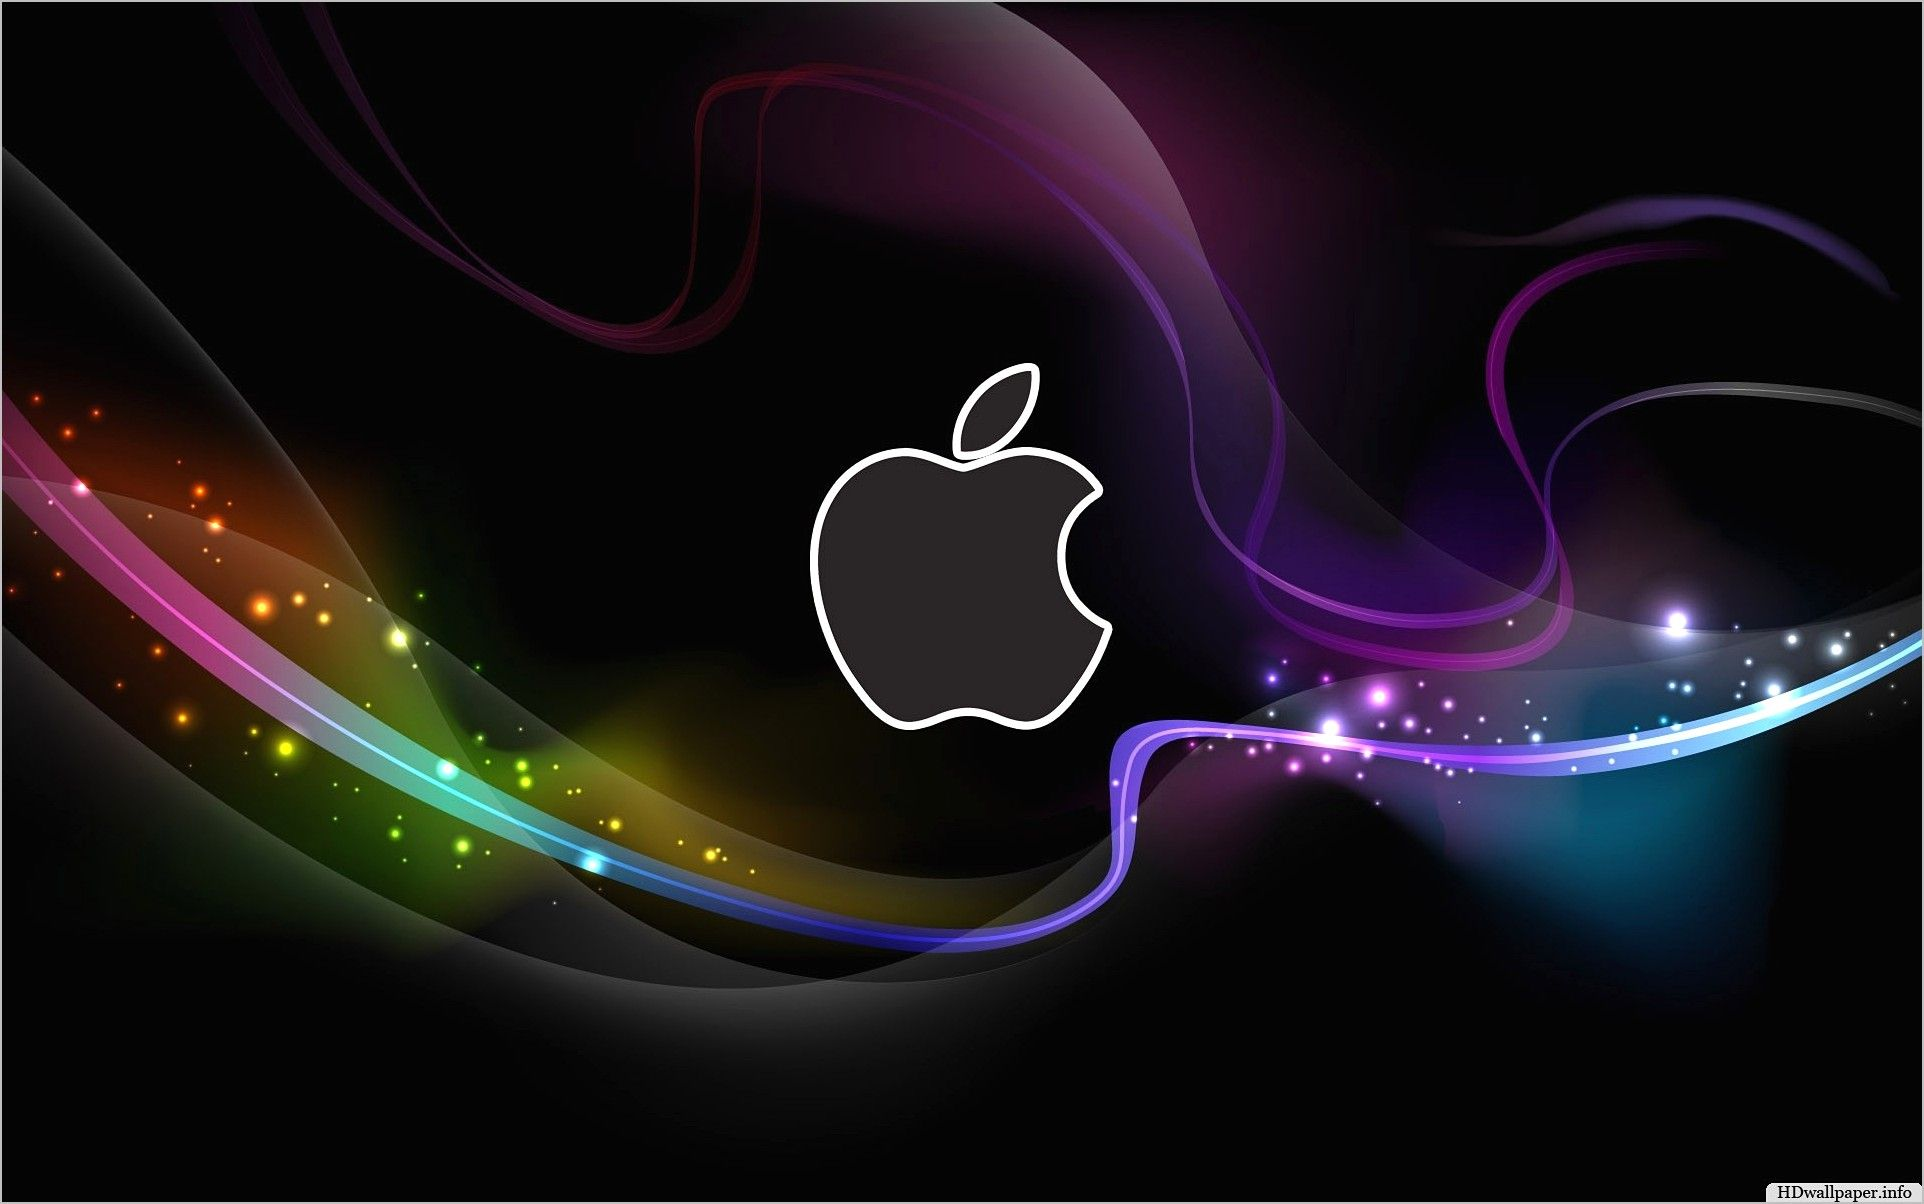 Moving 4k Wallpaper Mac Os Apple Iphone Wallpaper Hd Black Apple Wallpaper Apple Wallpaper